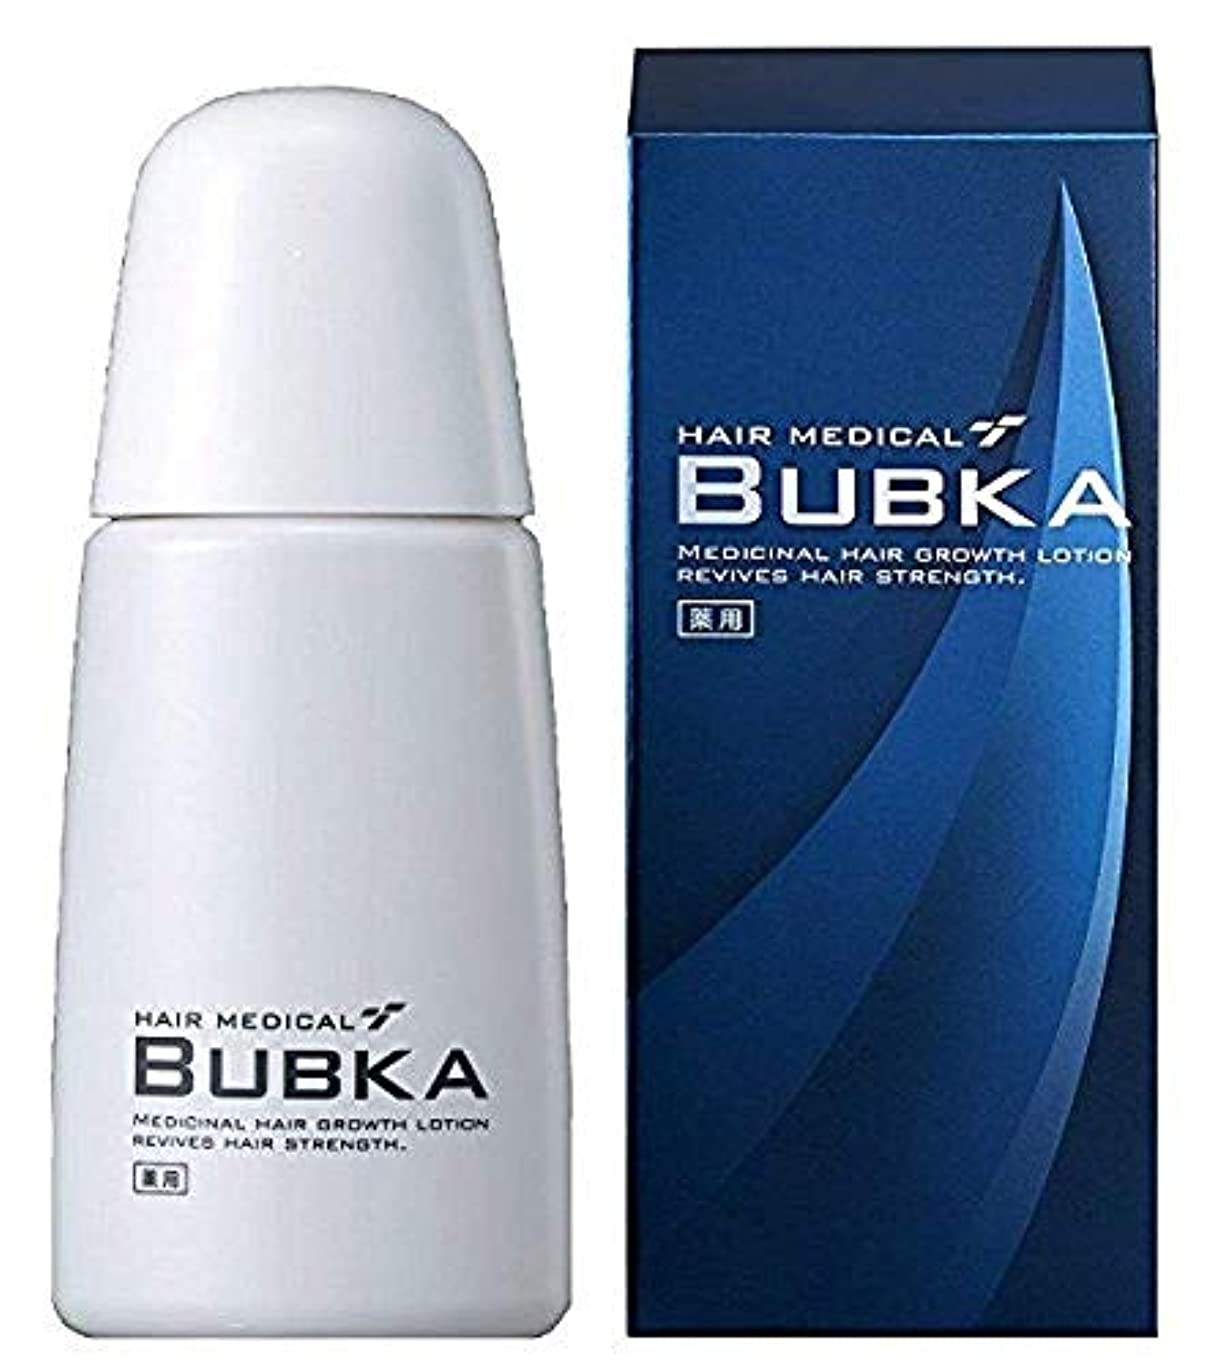 歩道高層ビル聖人【BUBKA ブブカ 】新型 濃密育毛剤 ブブカ-003M (内容量:120ml 約1ヶ月分)(医薬部外品)